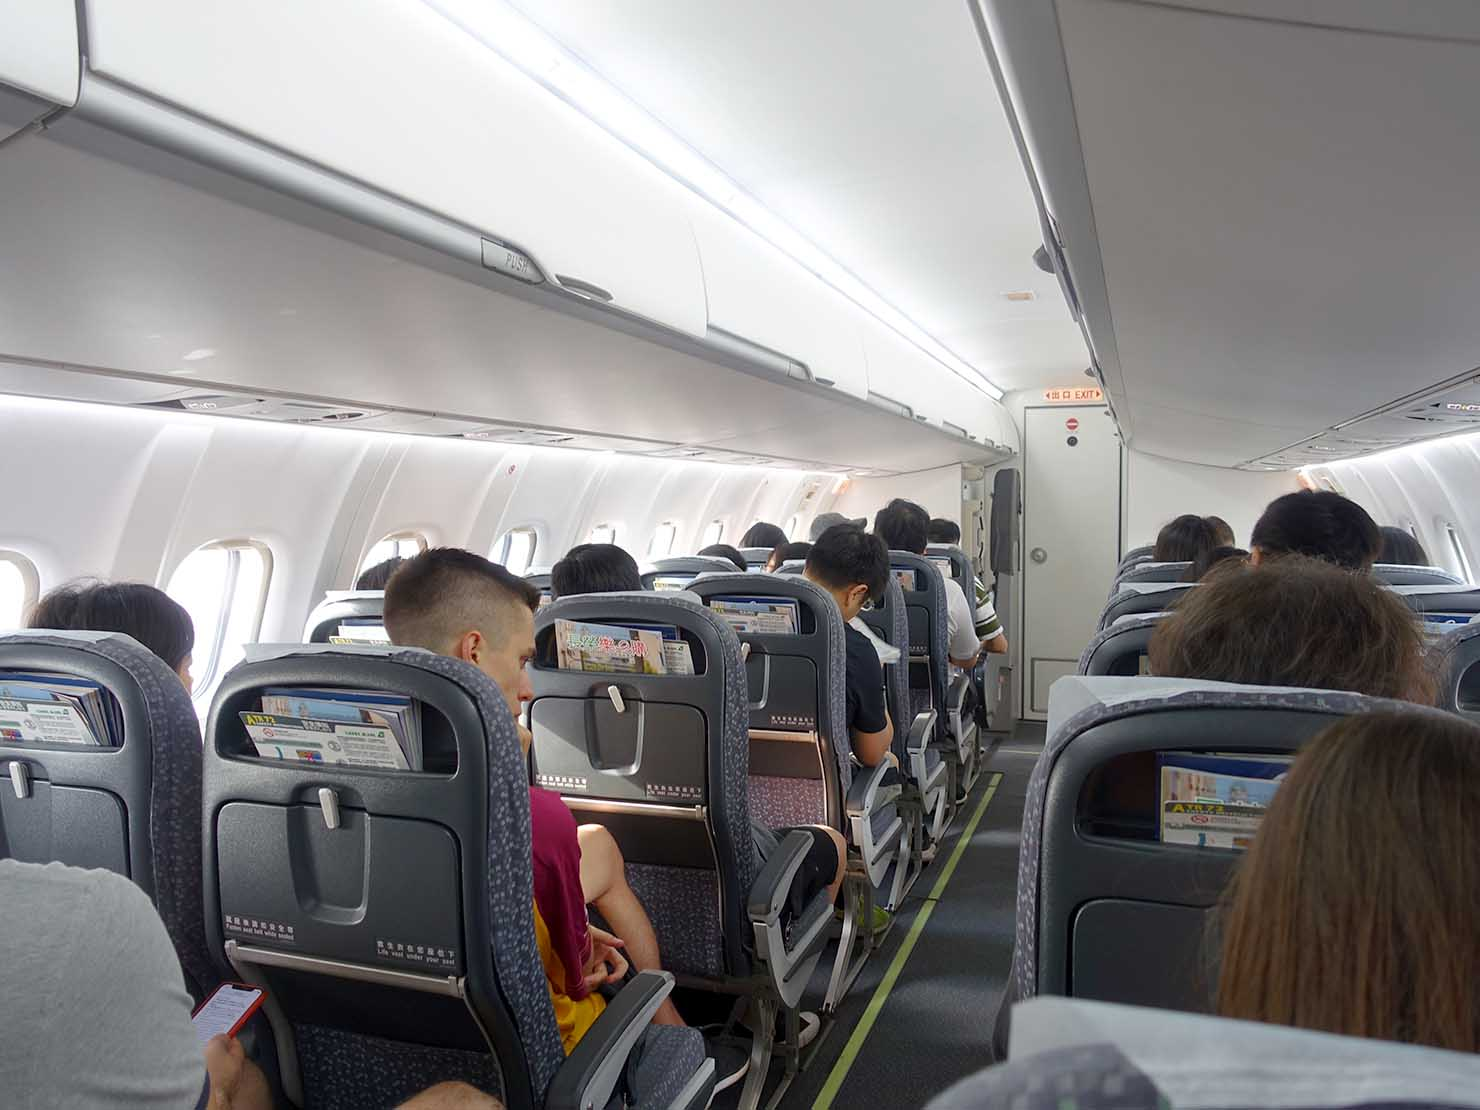 KKday外国人限定「花蓮・太魯閣(タロコ)日帰りツアー」立榮航空(UNI AIR)の機内